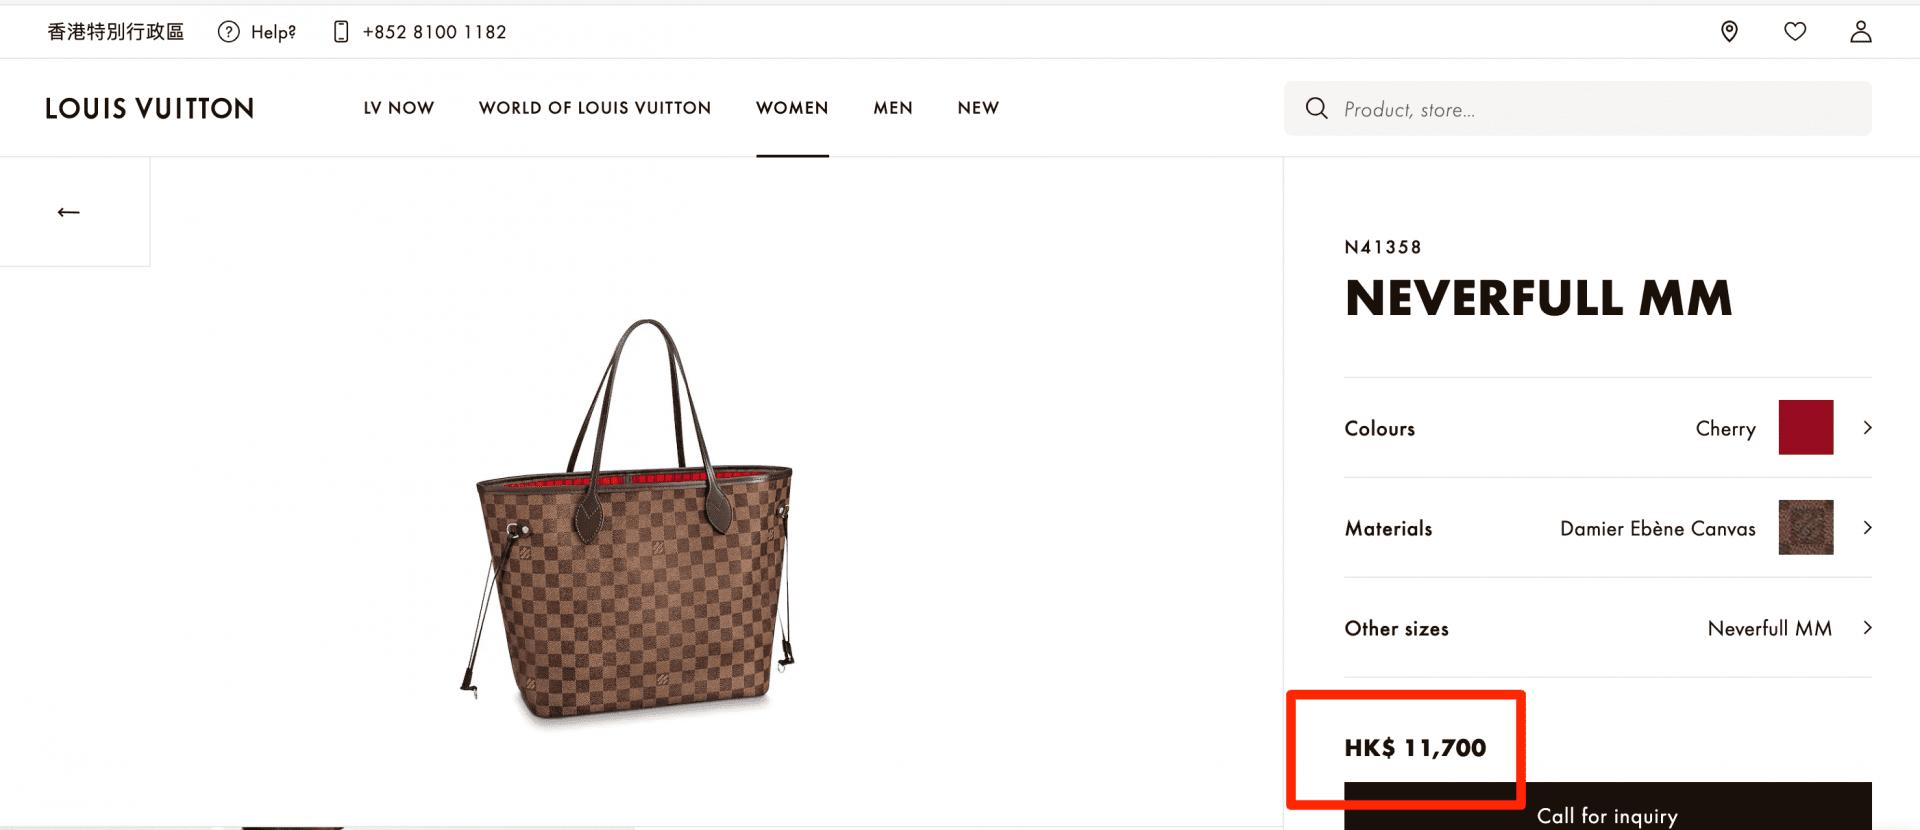 Louis Vuitton Neverfull Hong Kong pricing